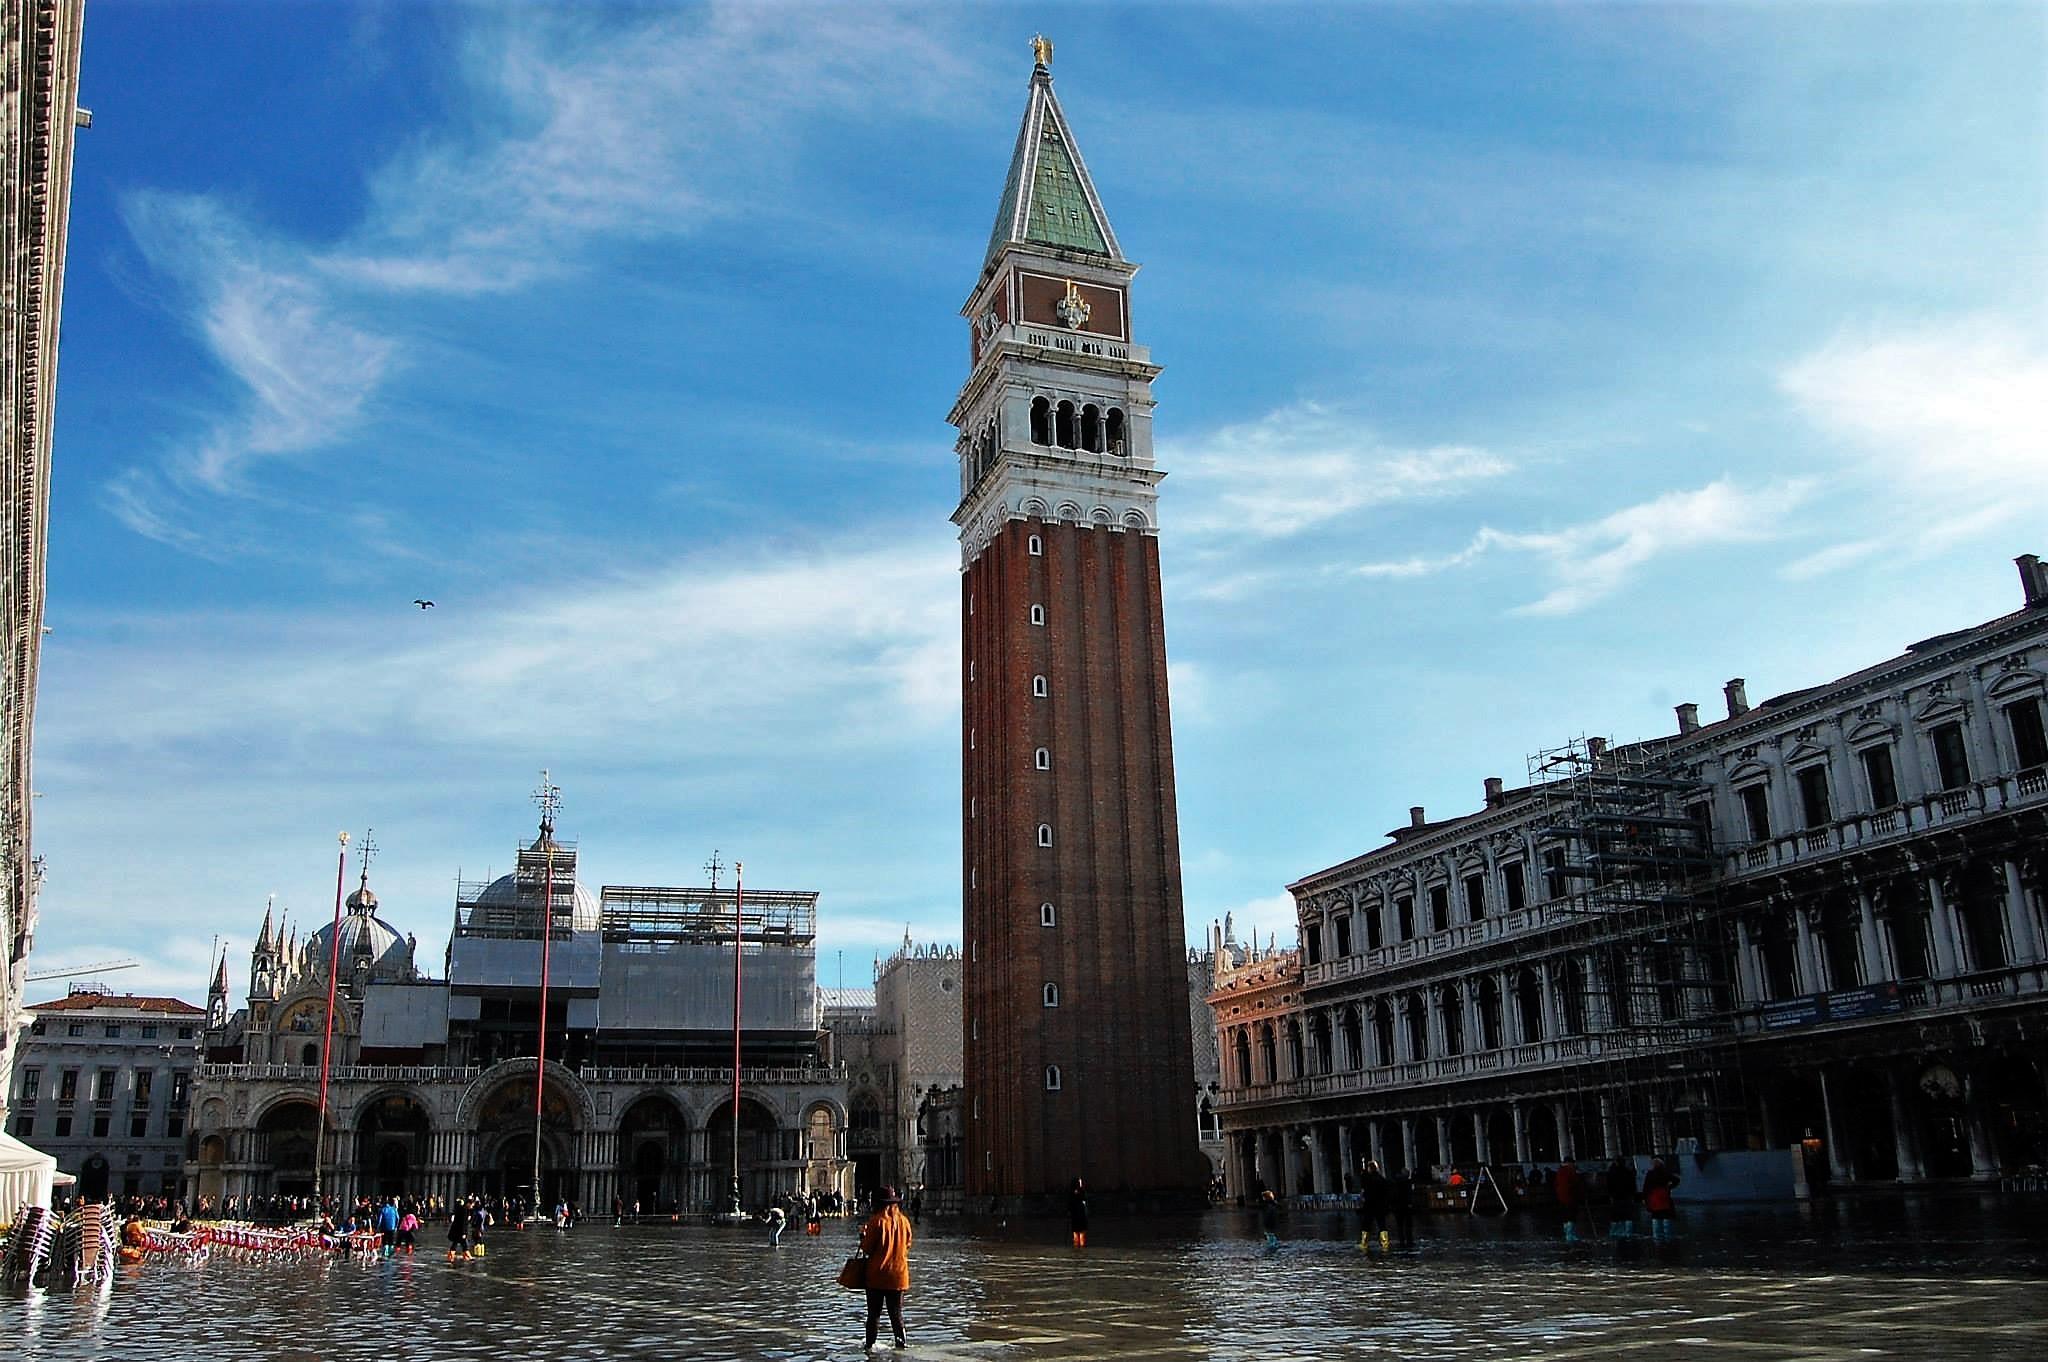 acqua alta, venice, italy, piazza san marco, flood, sinking